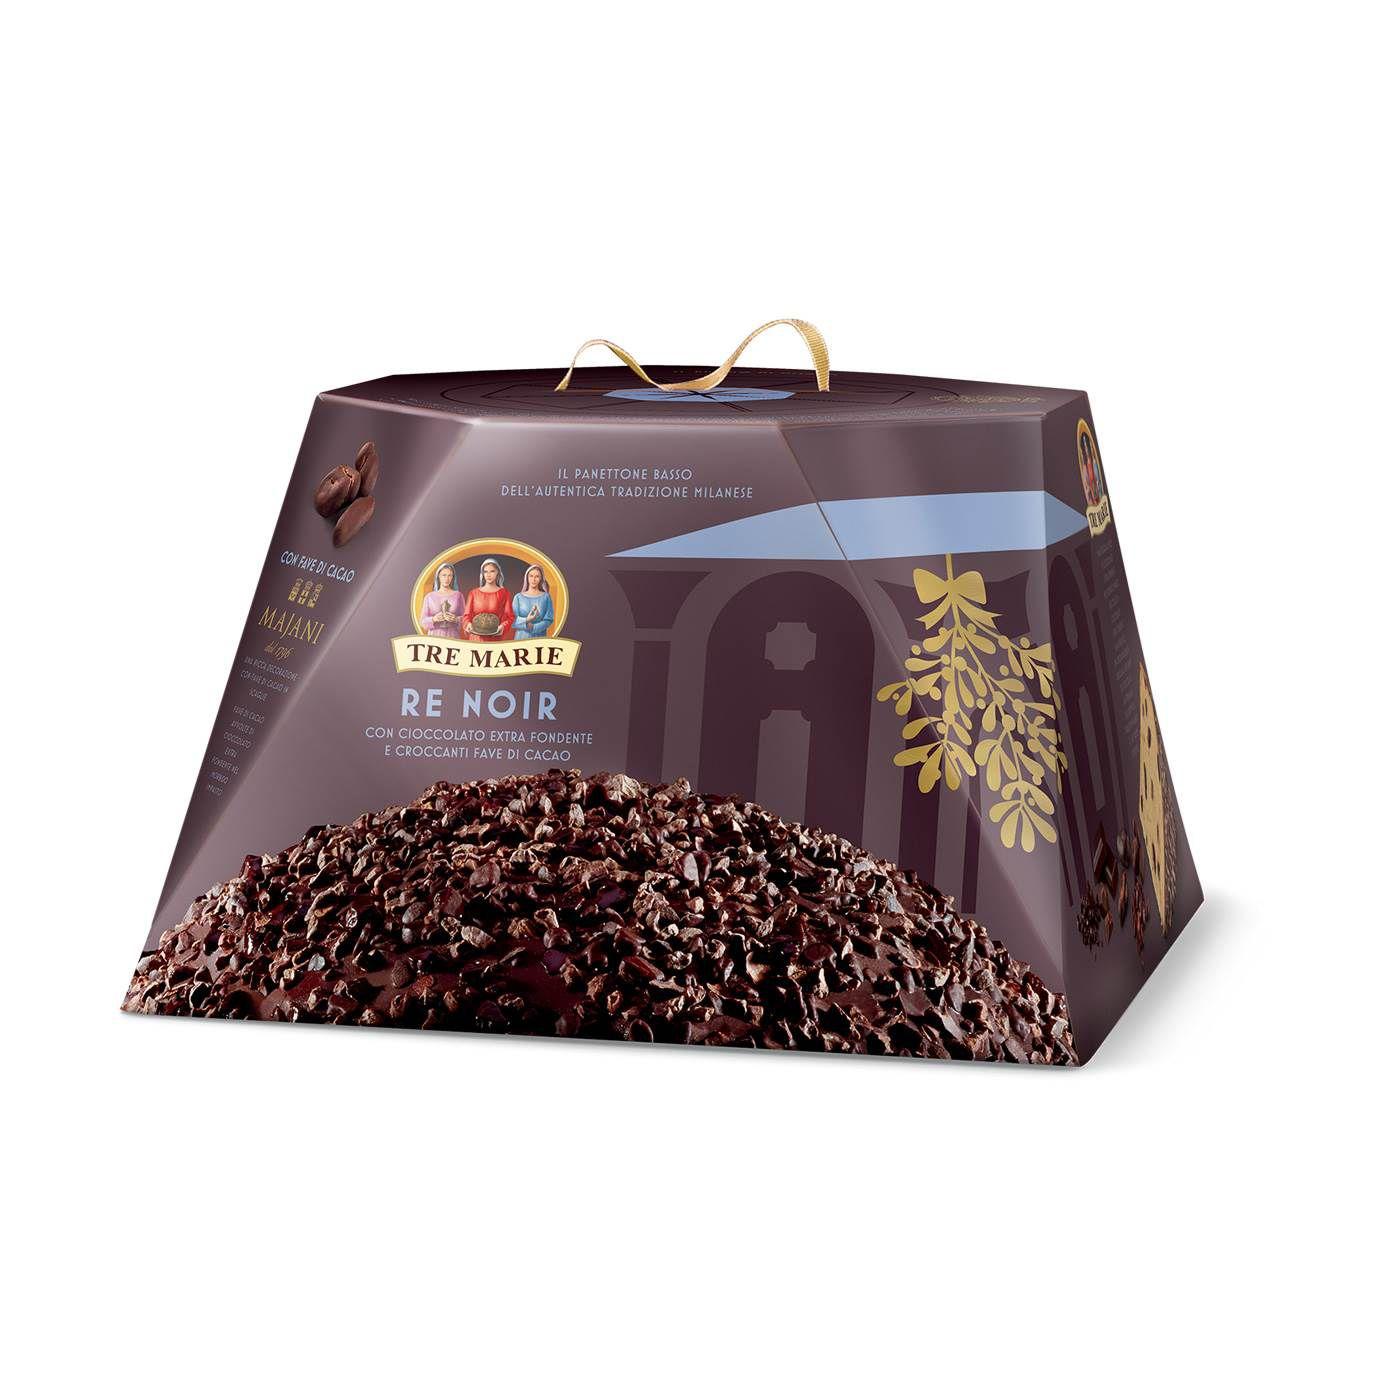 Panetone Milanese Chocolate Re Noir Tre Marie 900gr